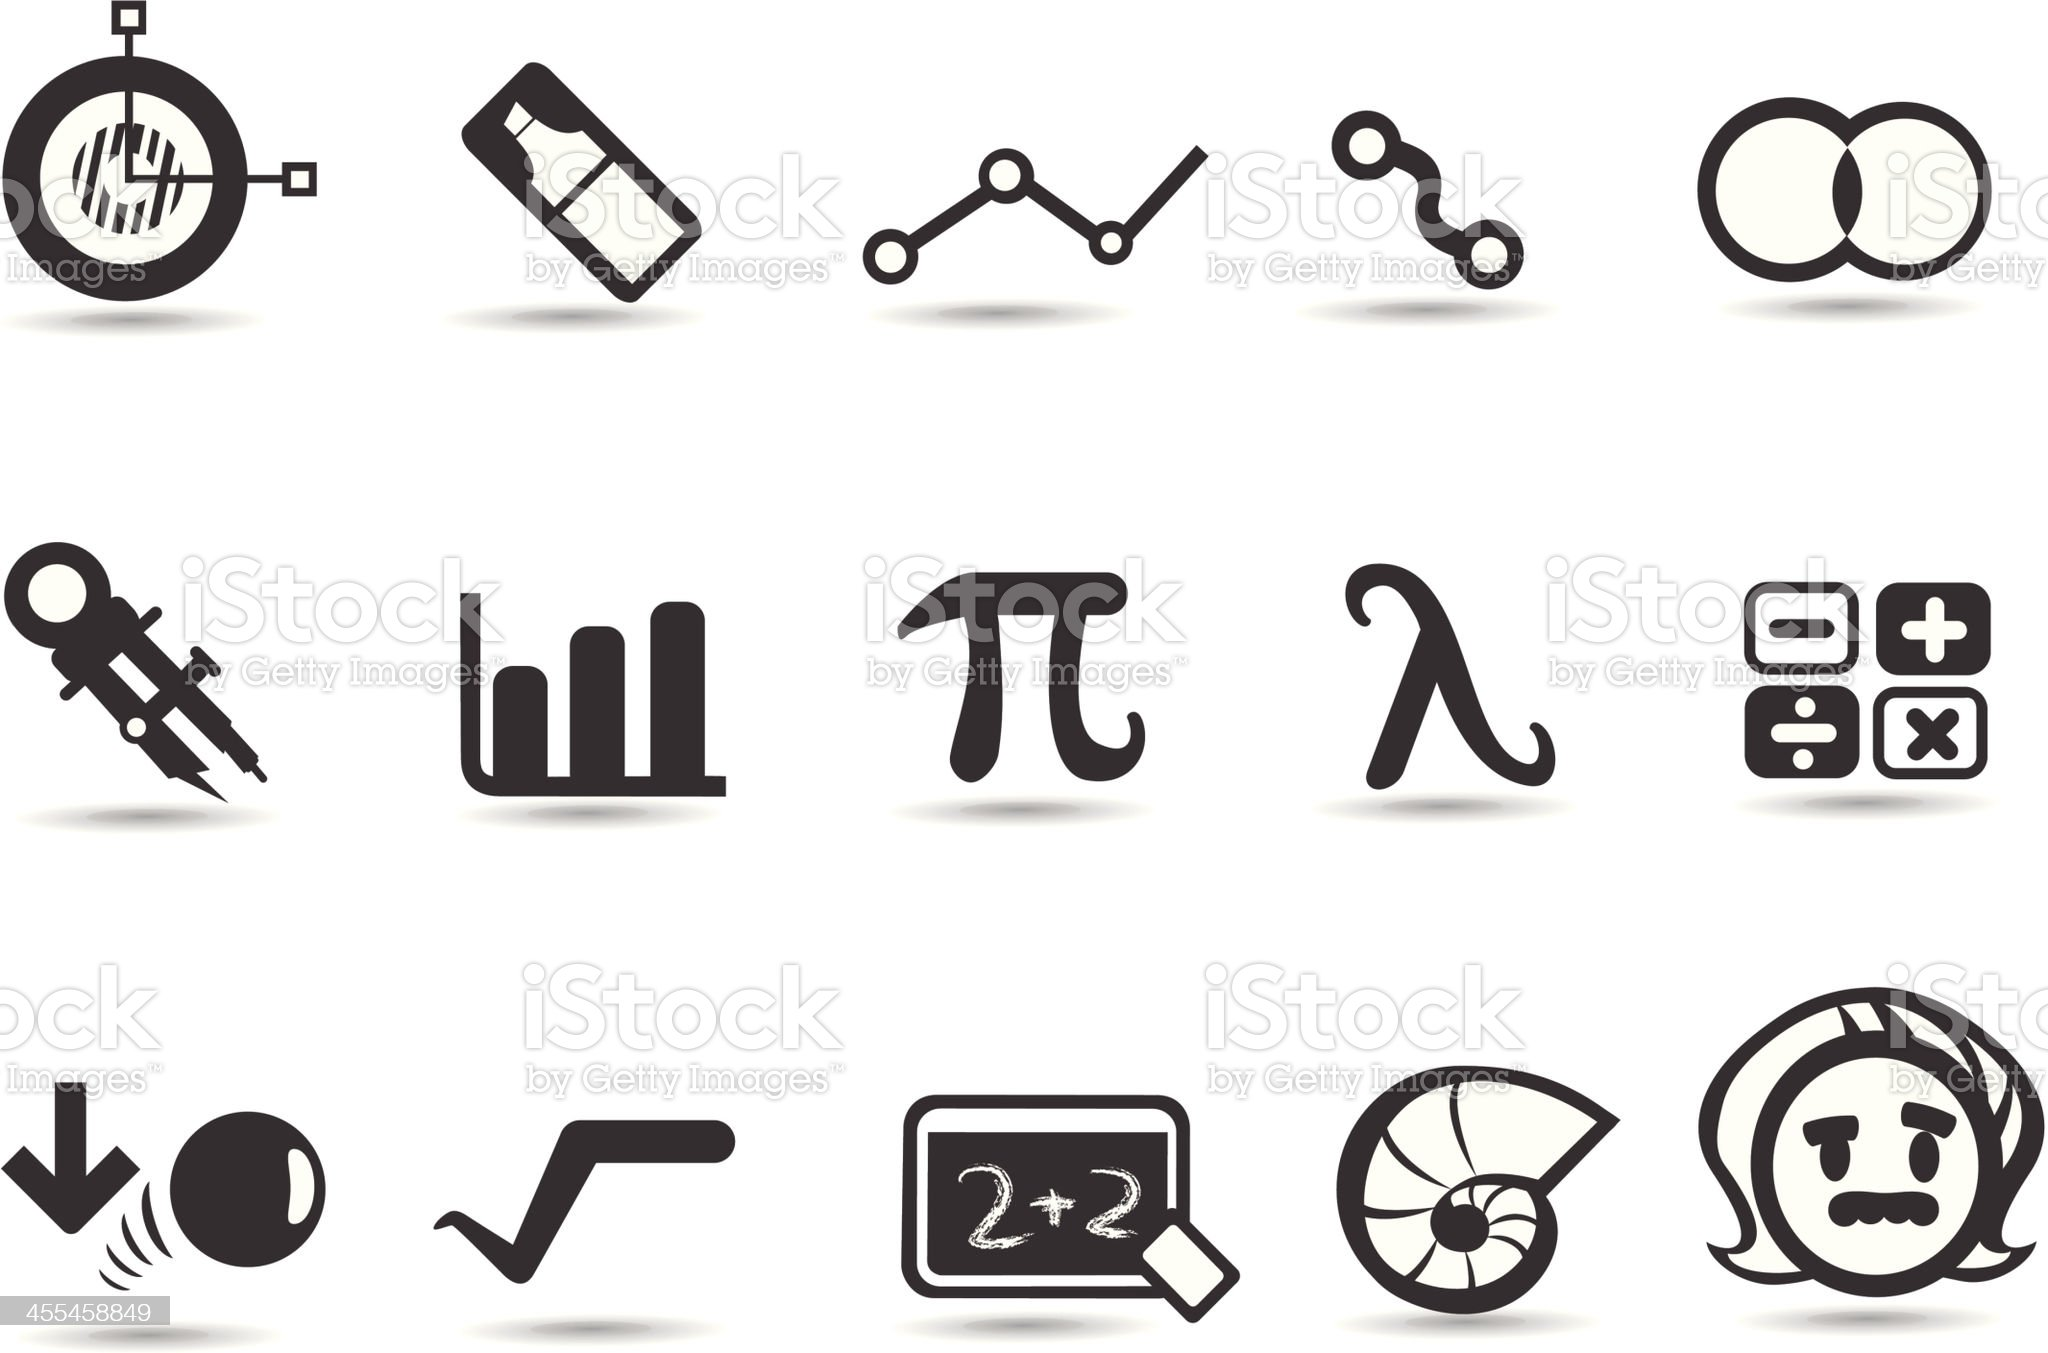 Math Icons royalty-free stock vector art